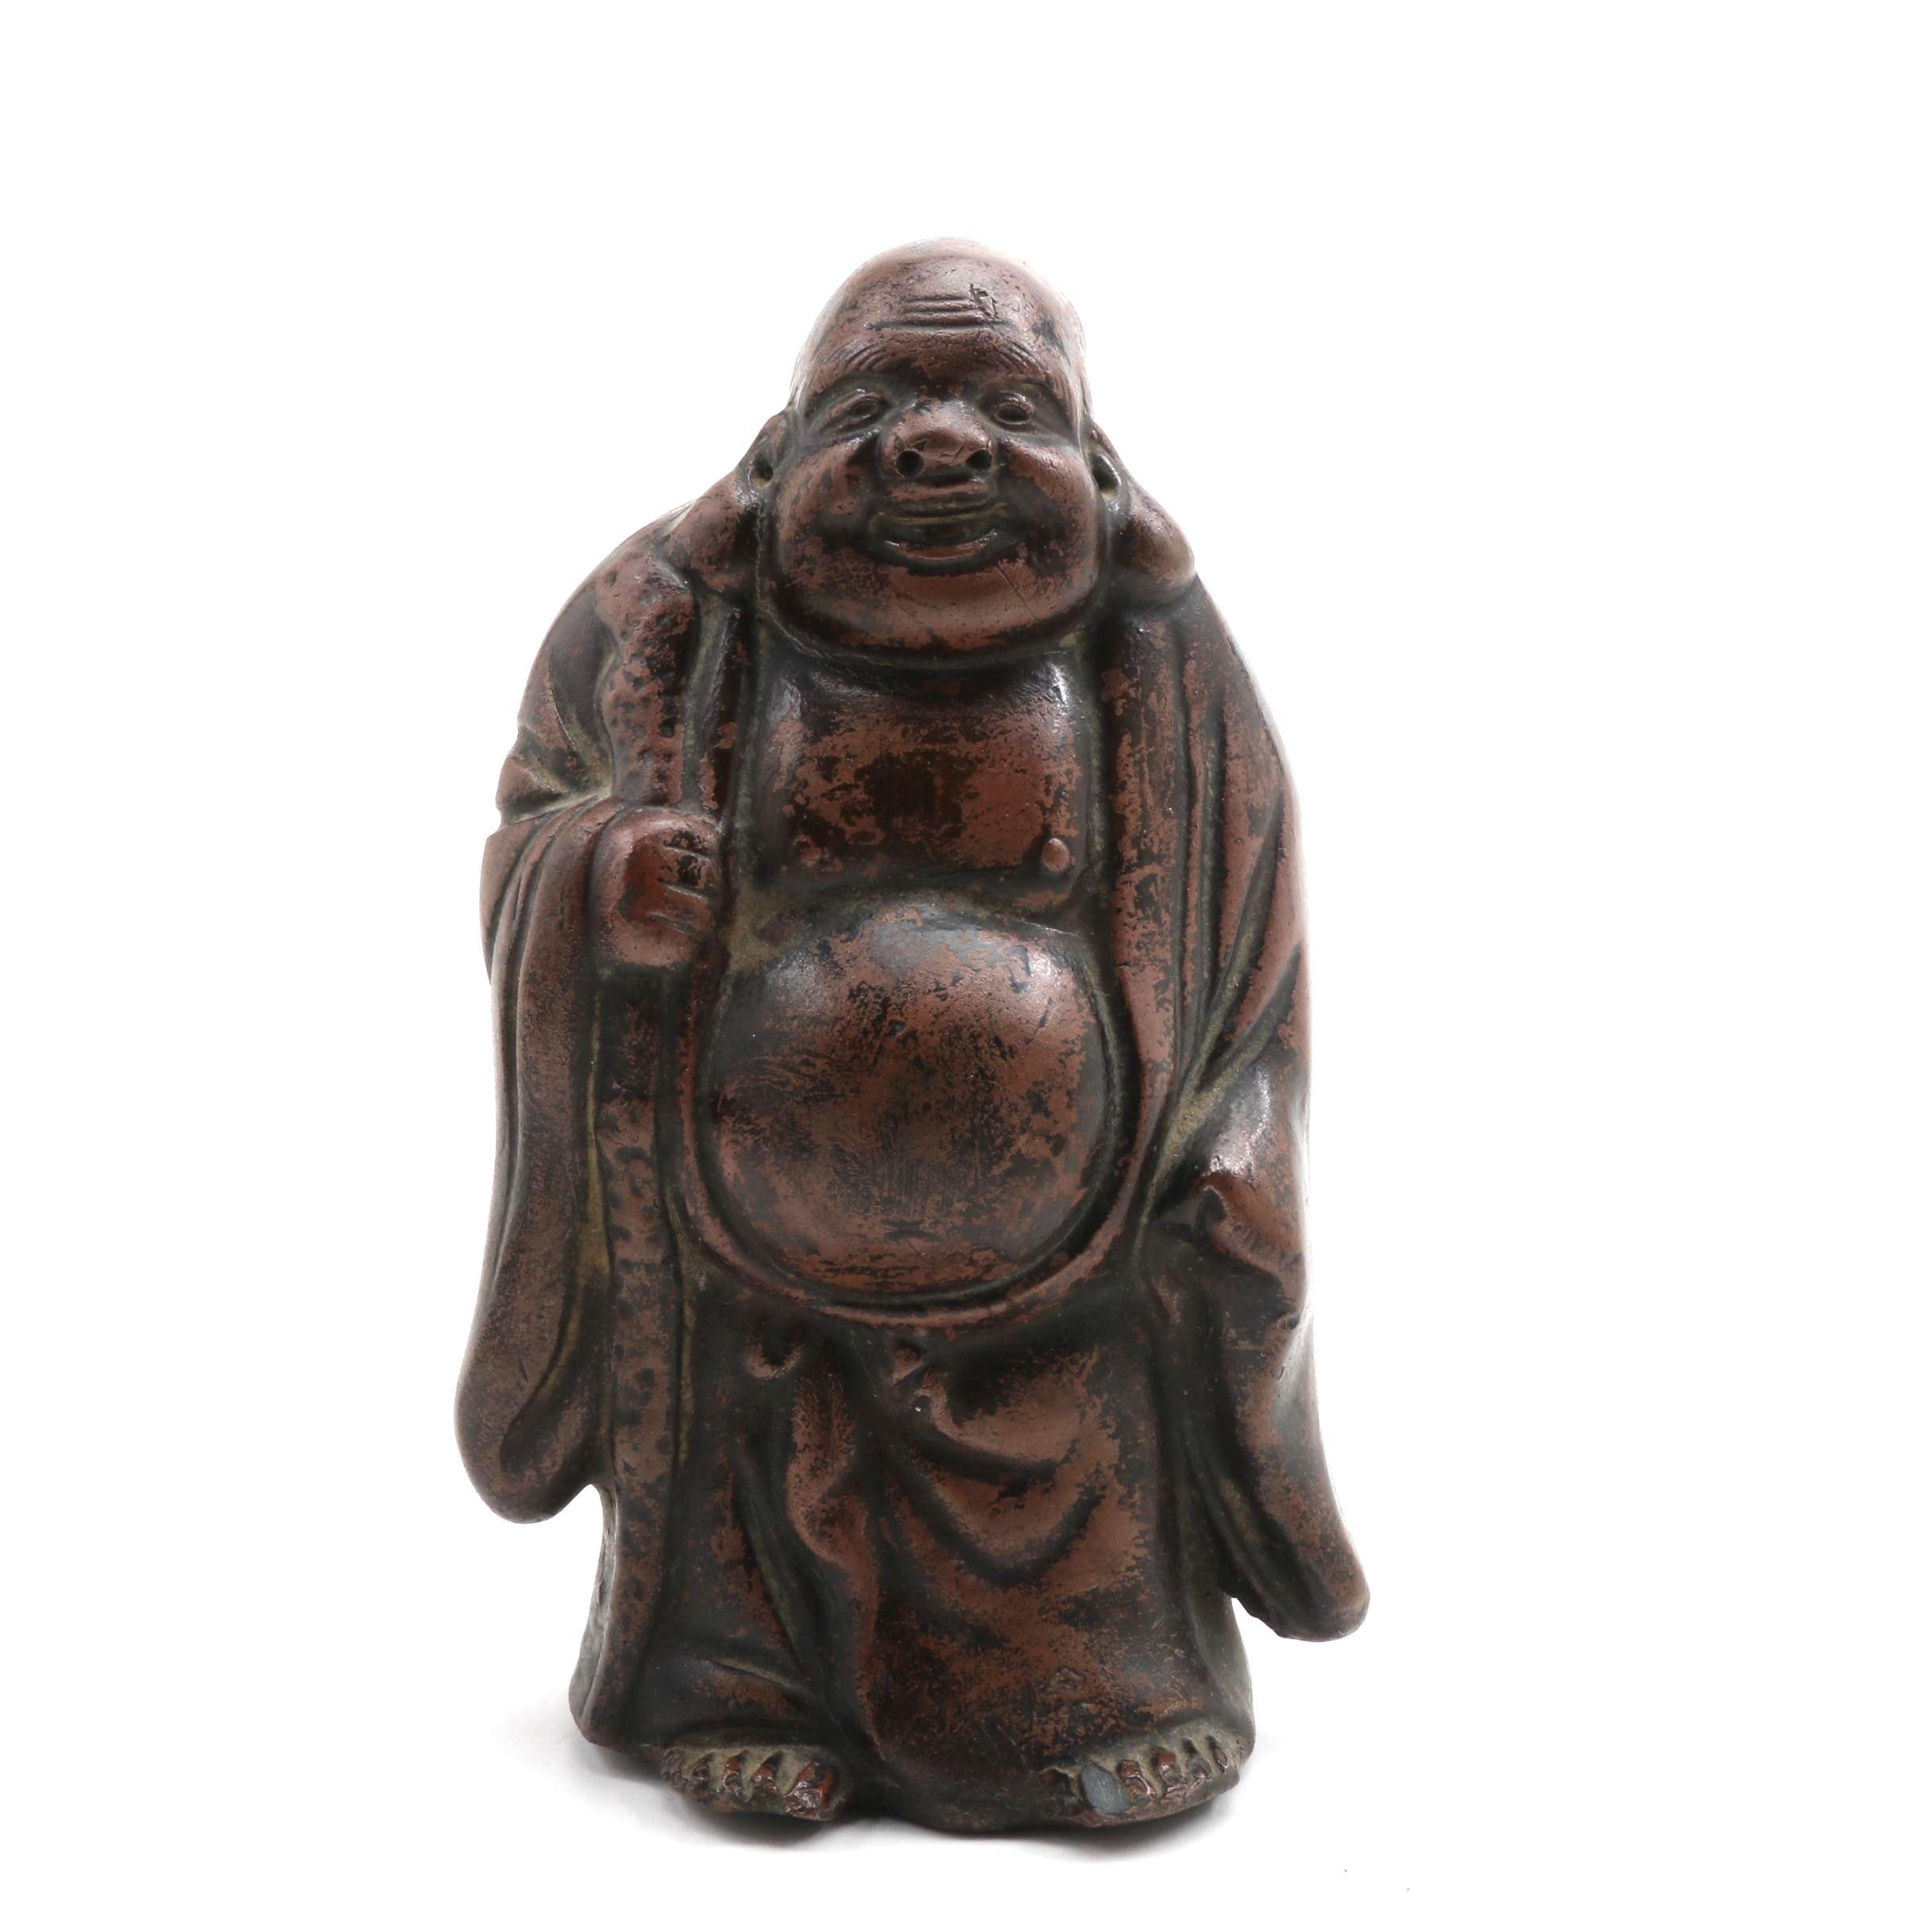 Japanese Bizen Ware Pottery Hotei Figurine